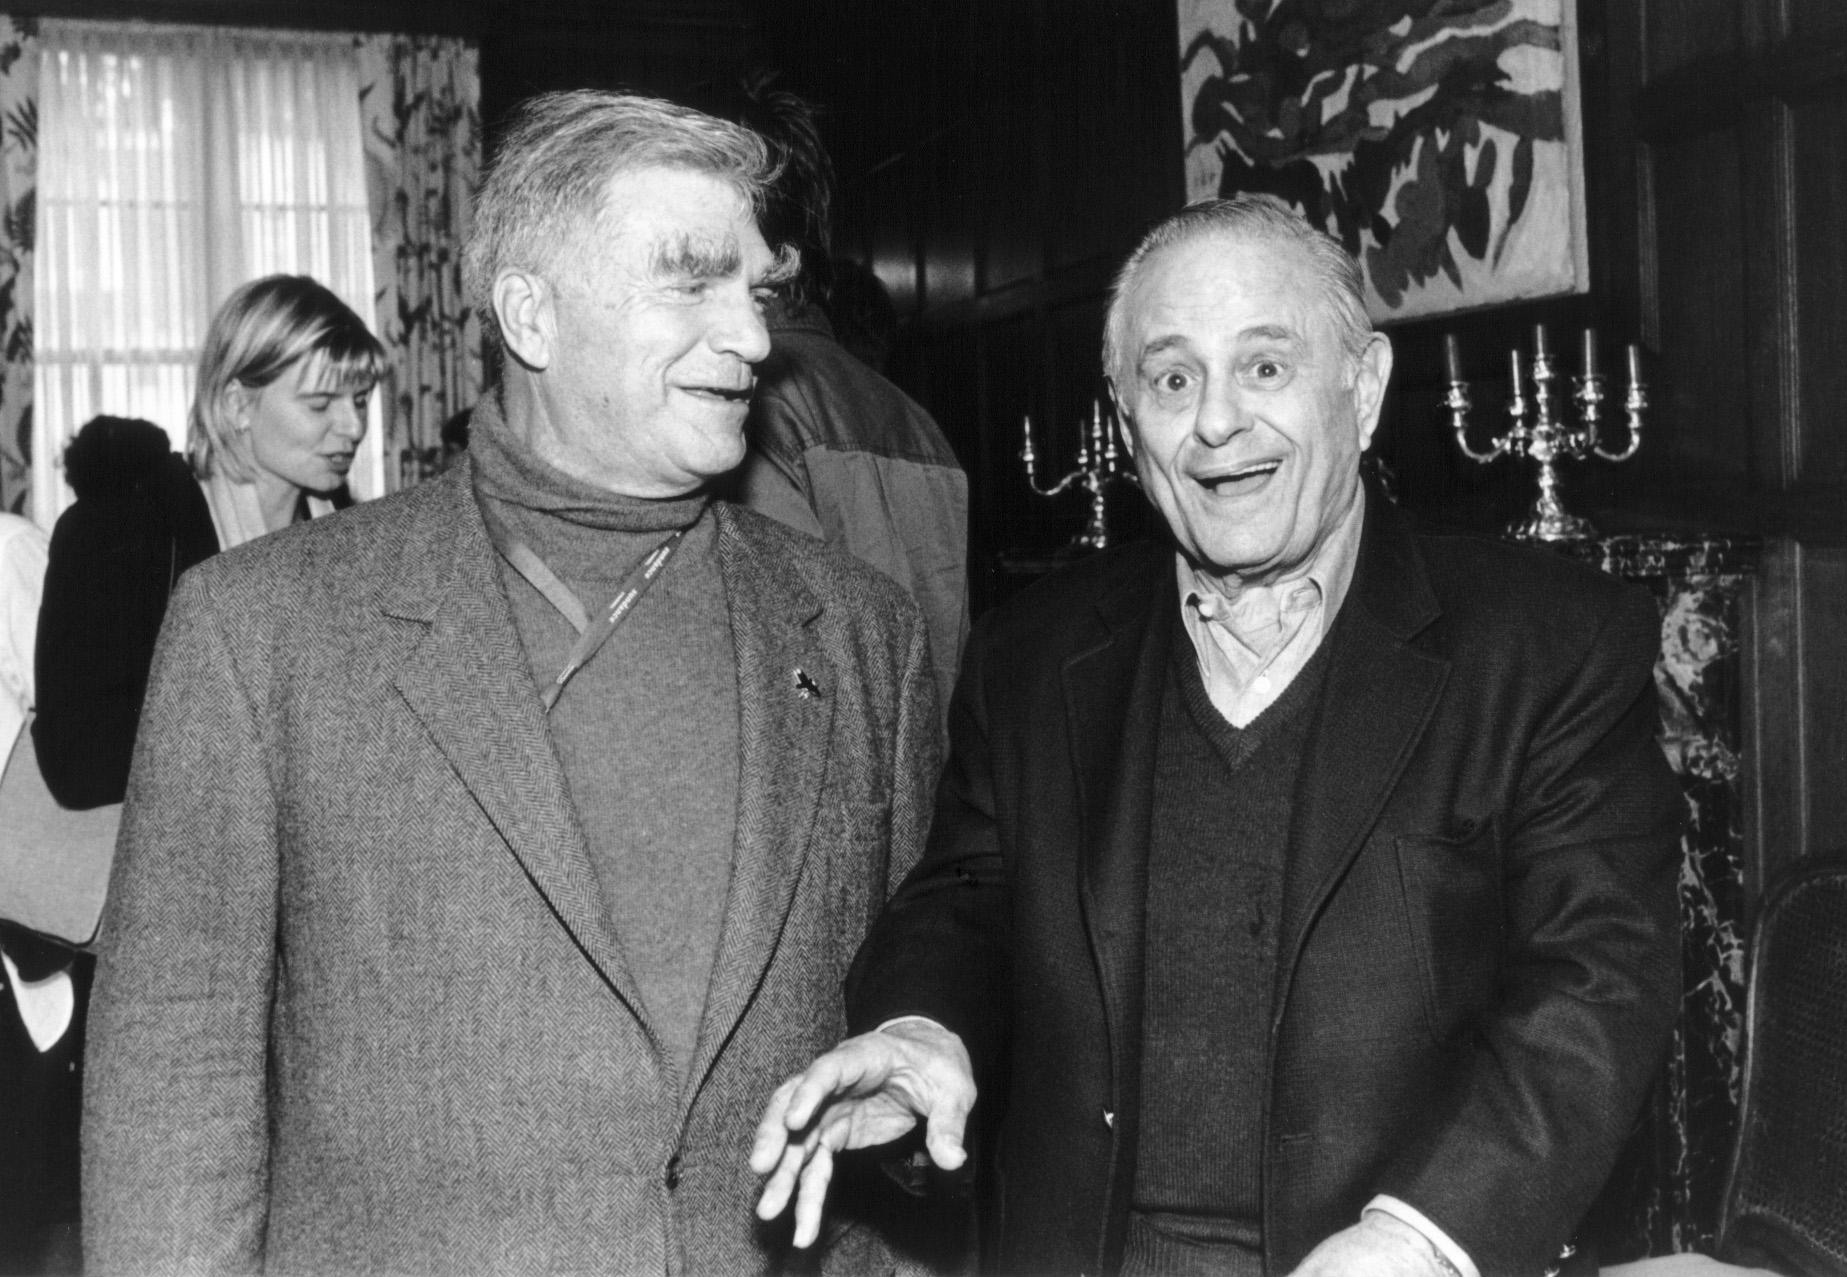 George Gund III and fellow SFFS board member Maurice Kanbar at the 47th San Francisco International Film Festival, 2004.  Photo by Pamela Gentile.